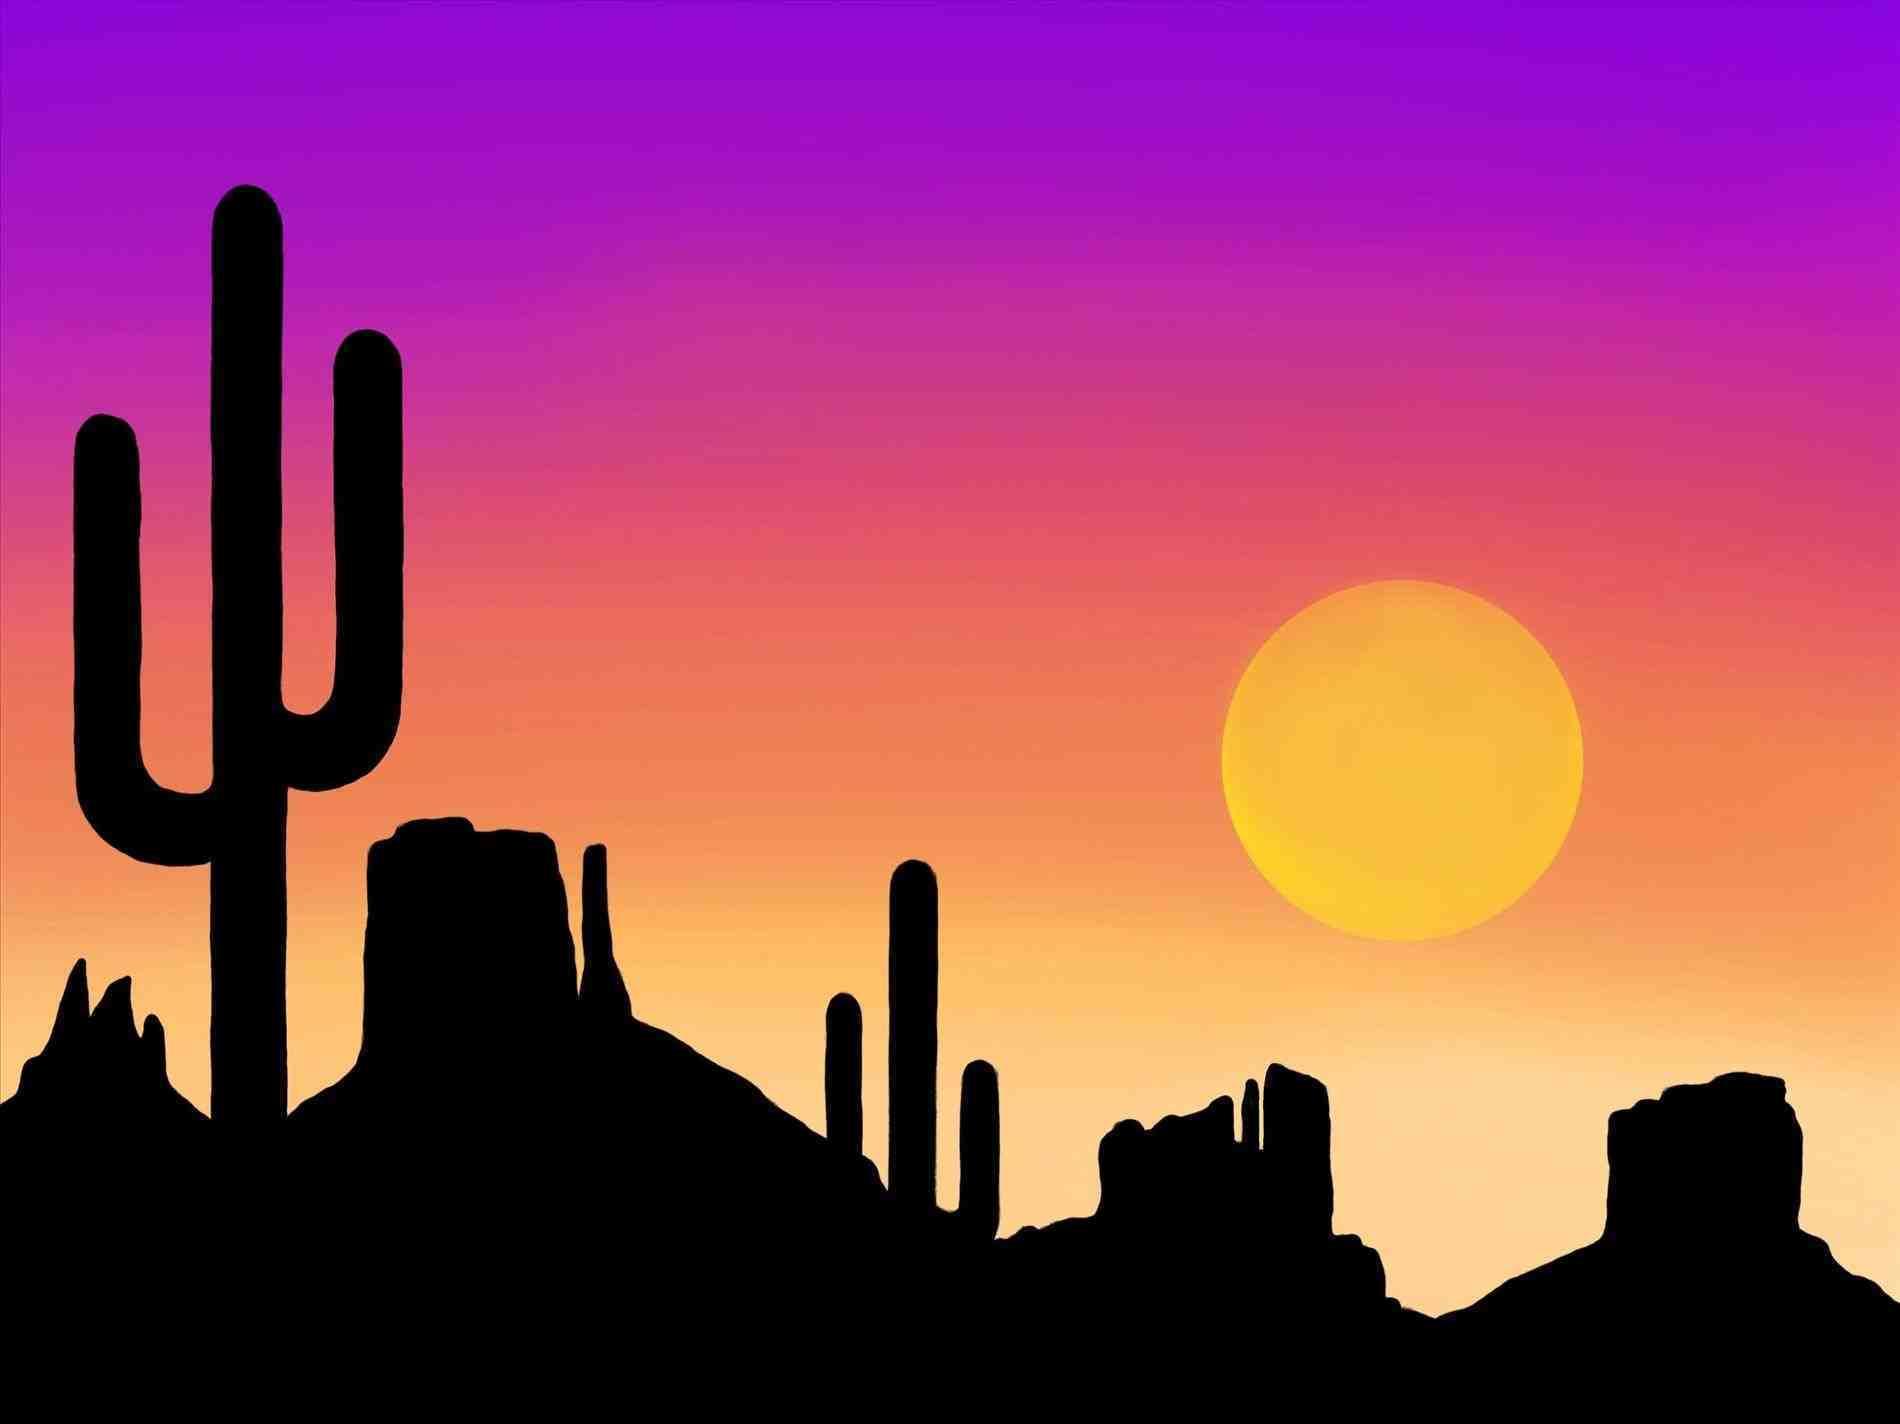 1900x1424 Landscape Sunset Drawing 2018